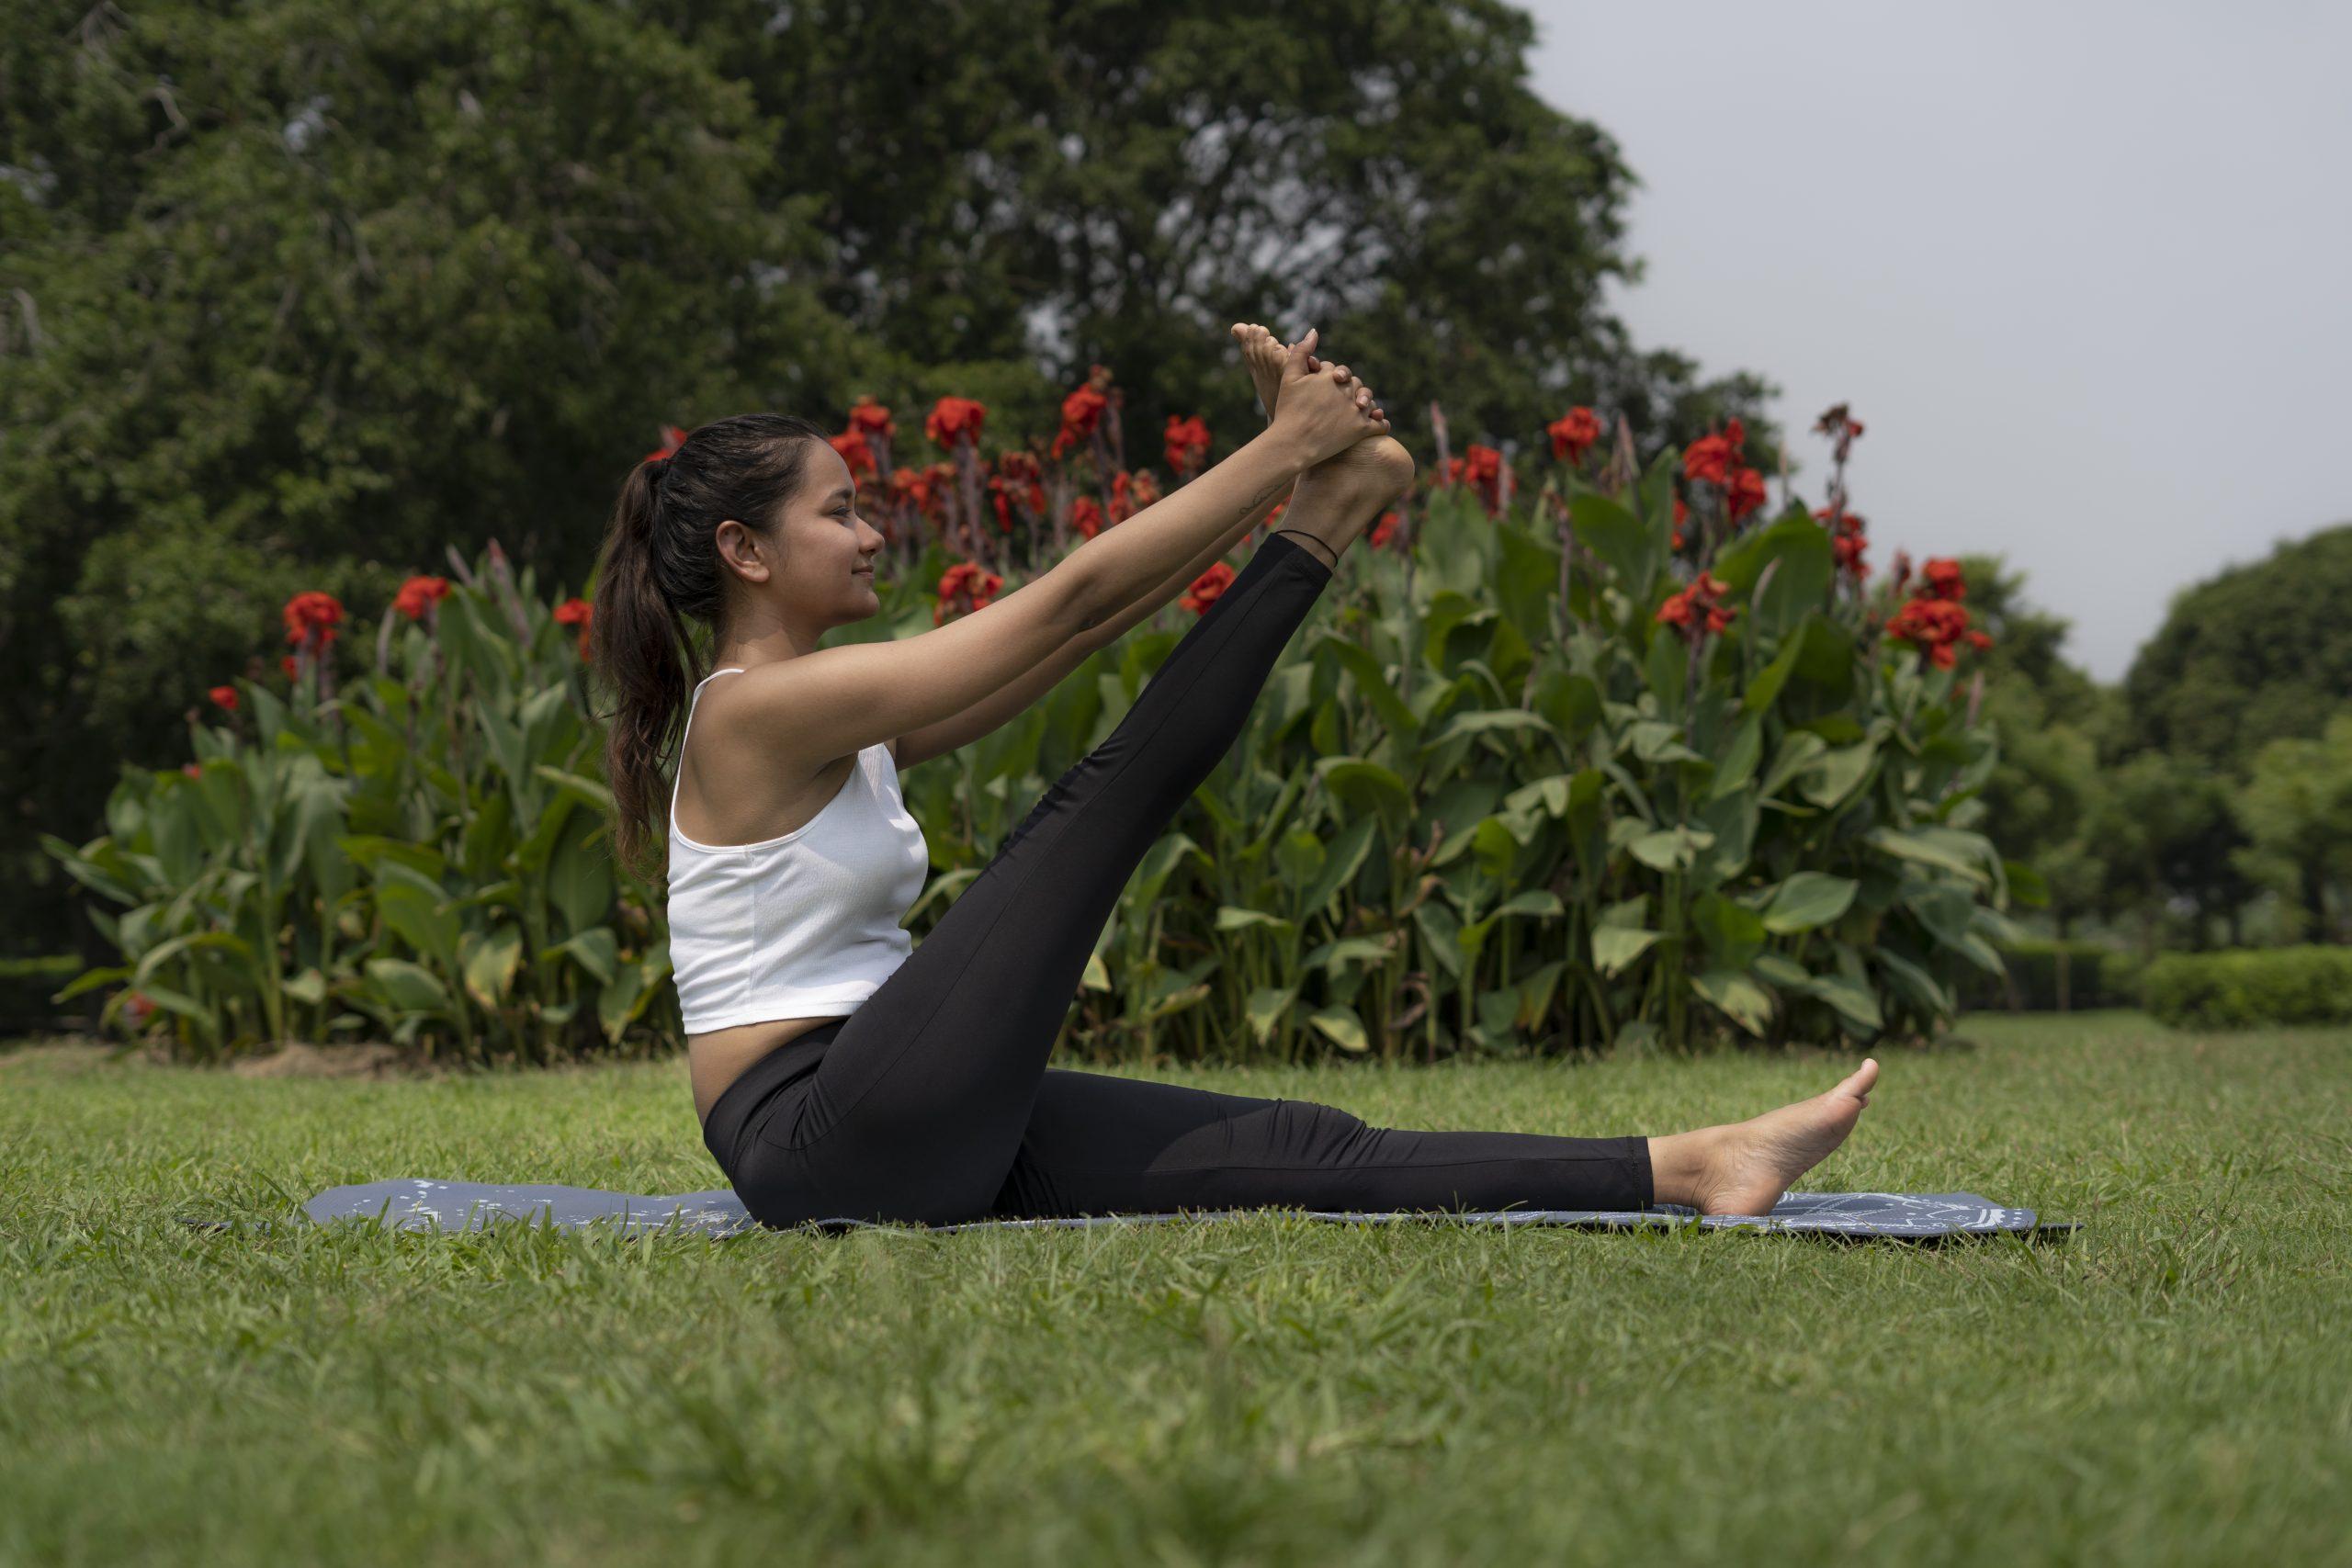 Indian Girl Yoga Pose on Mat